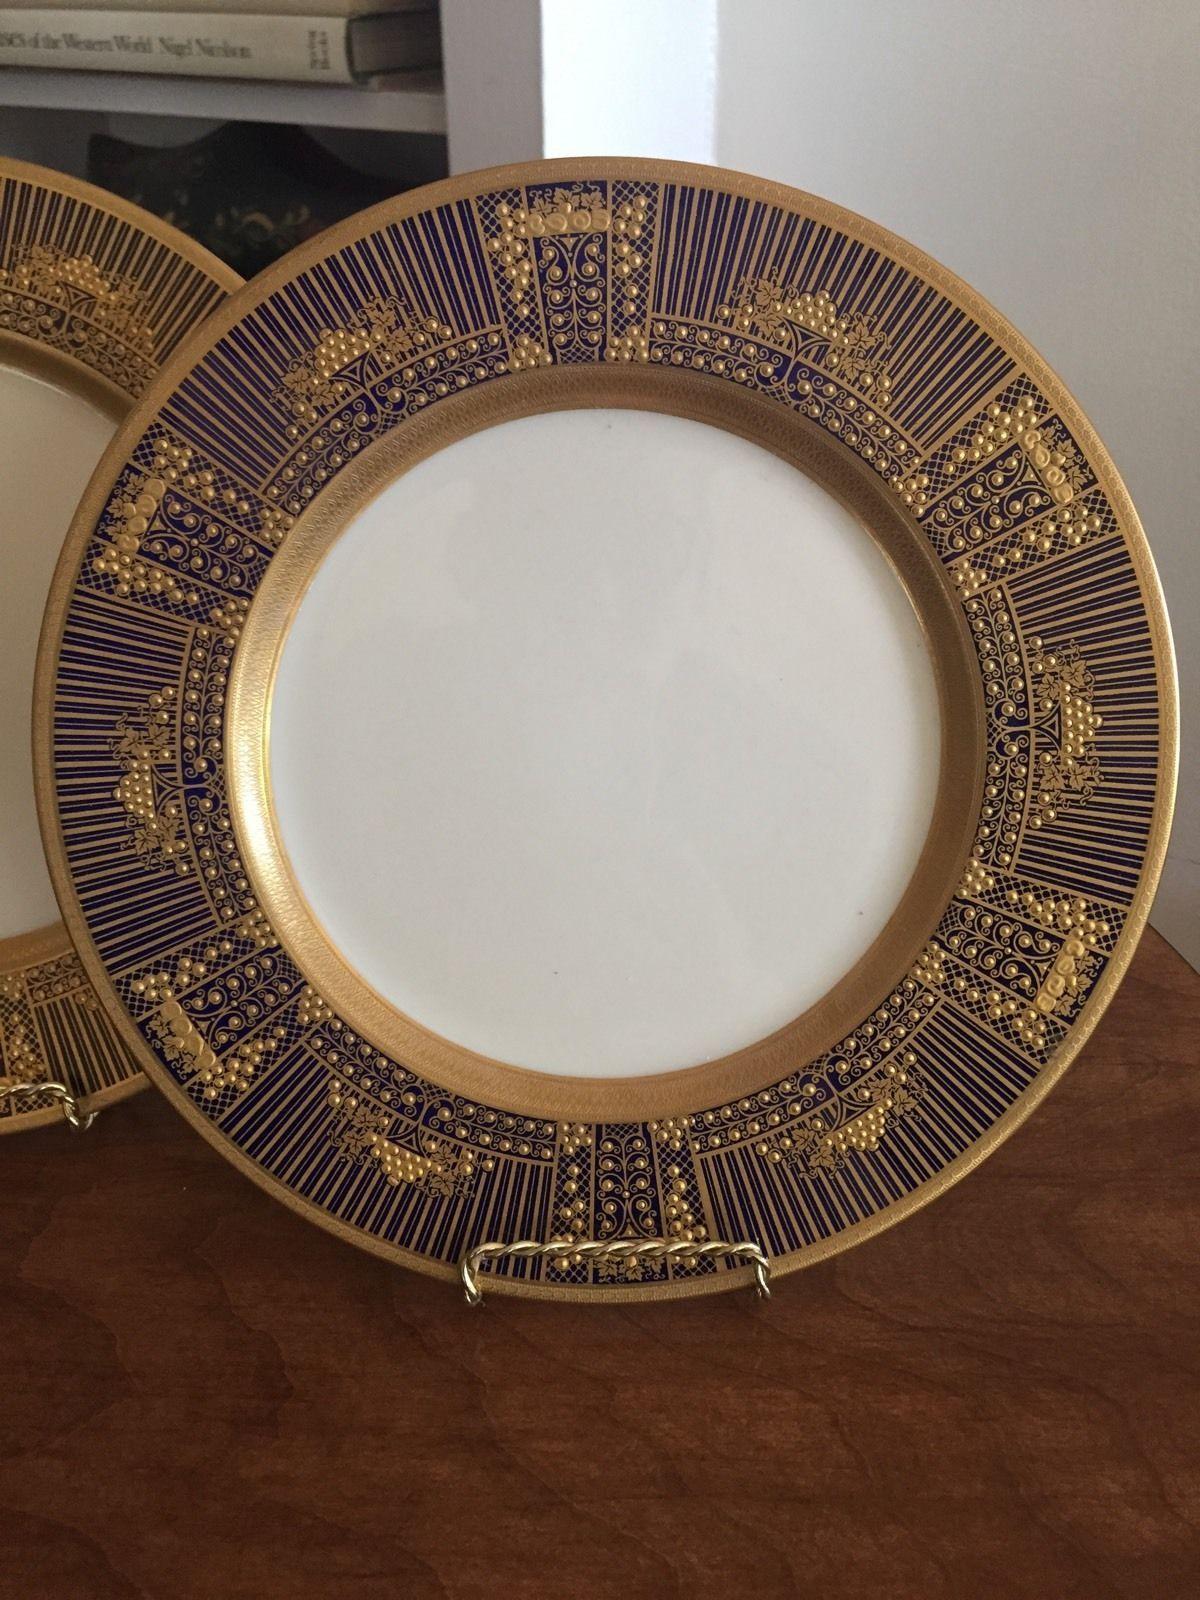 17a418886510 Fine Antique Lenox Dinner Service Plates Cobalt And Gold 1830 Pattern | eBay